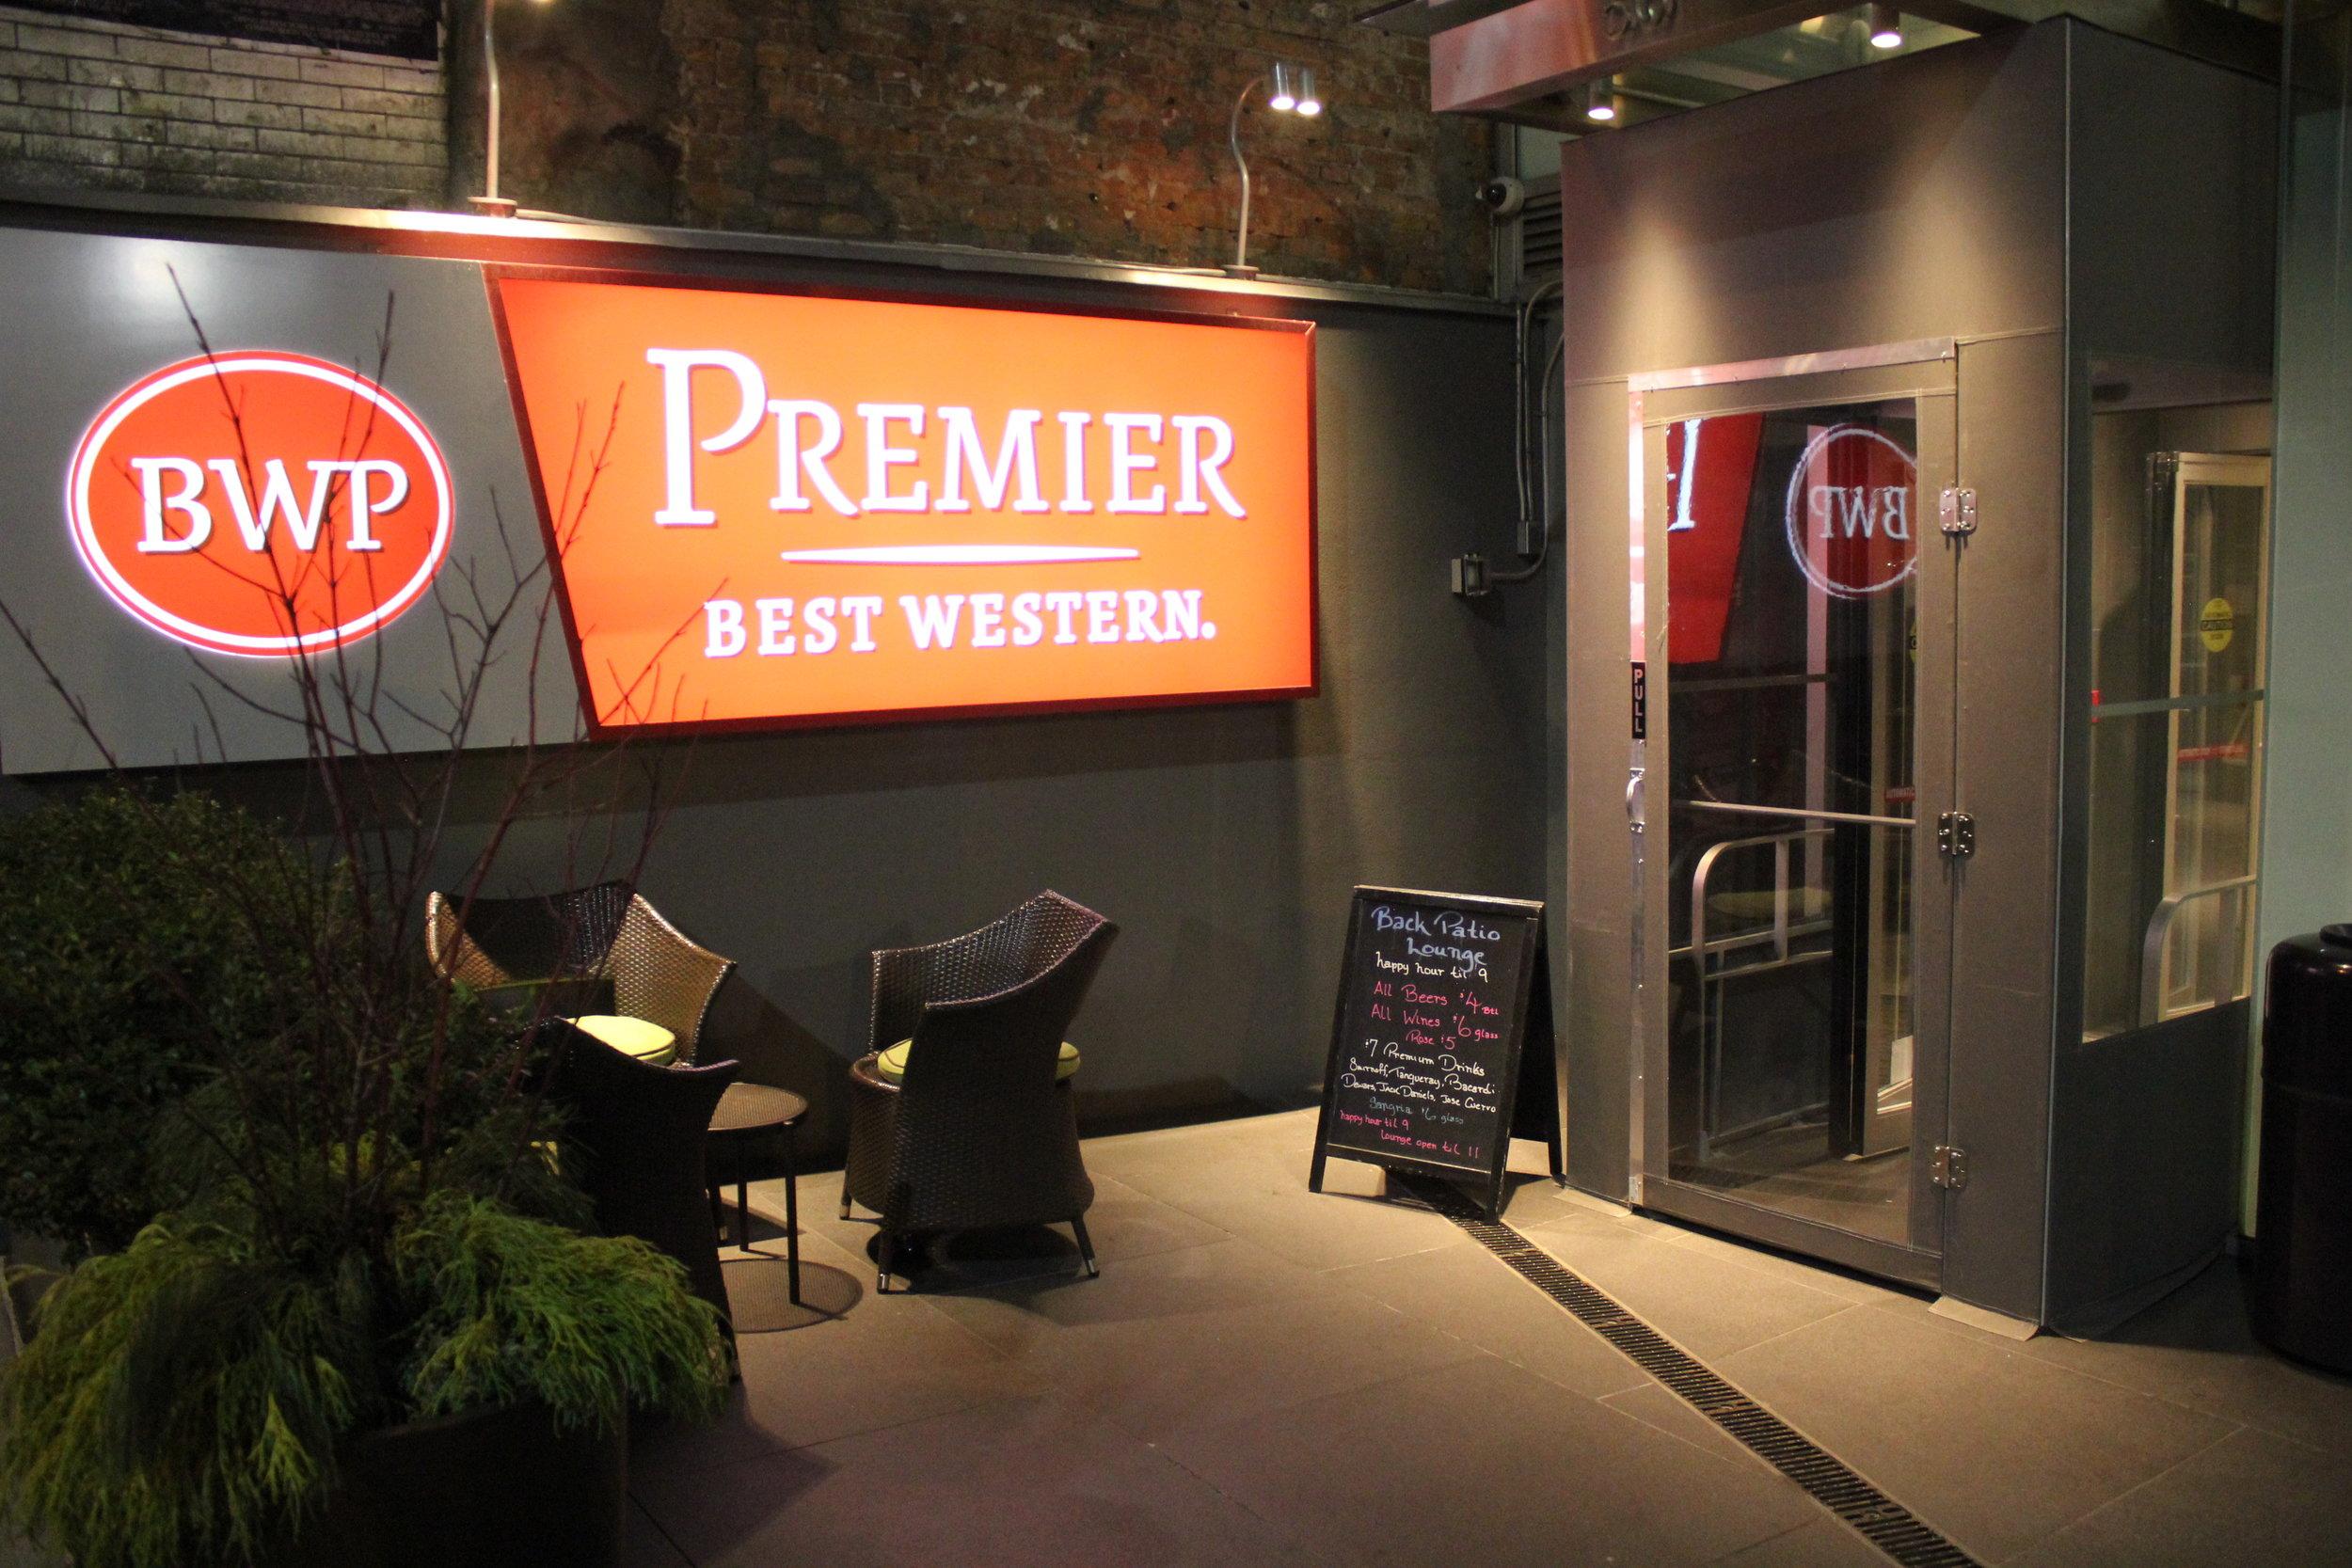 Best Western Premier New York Herald Square – Entrance